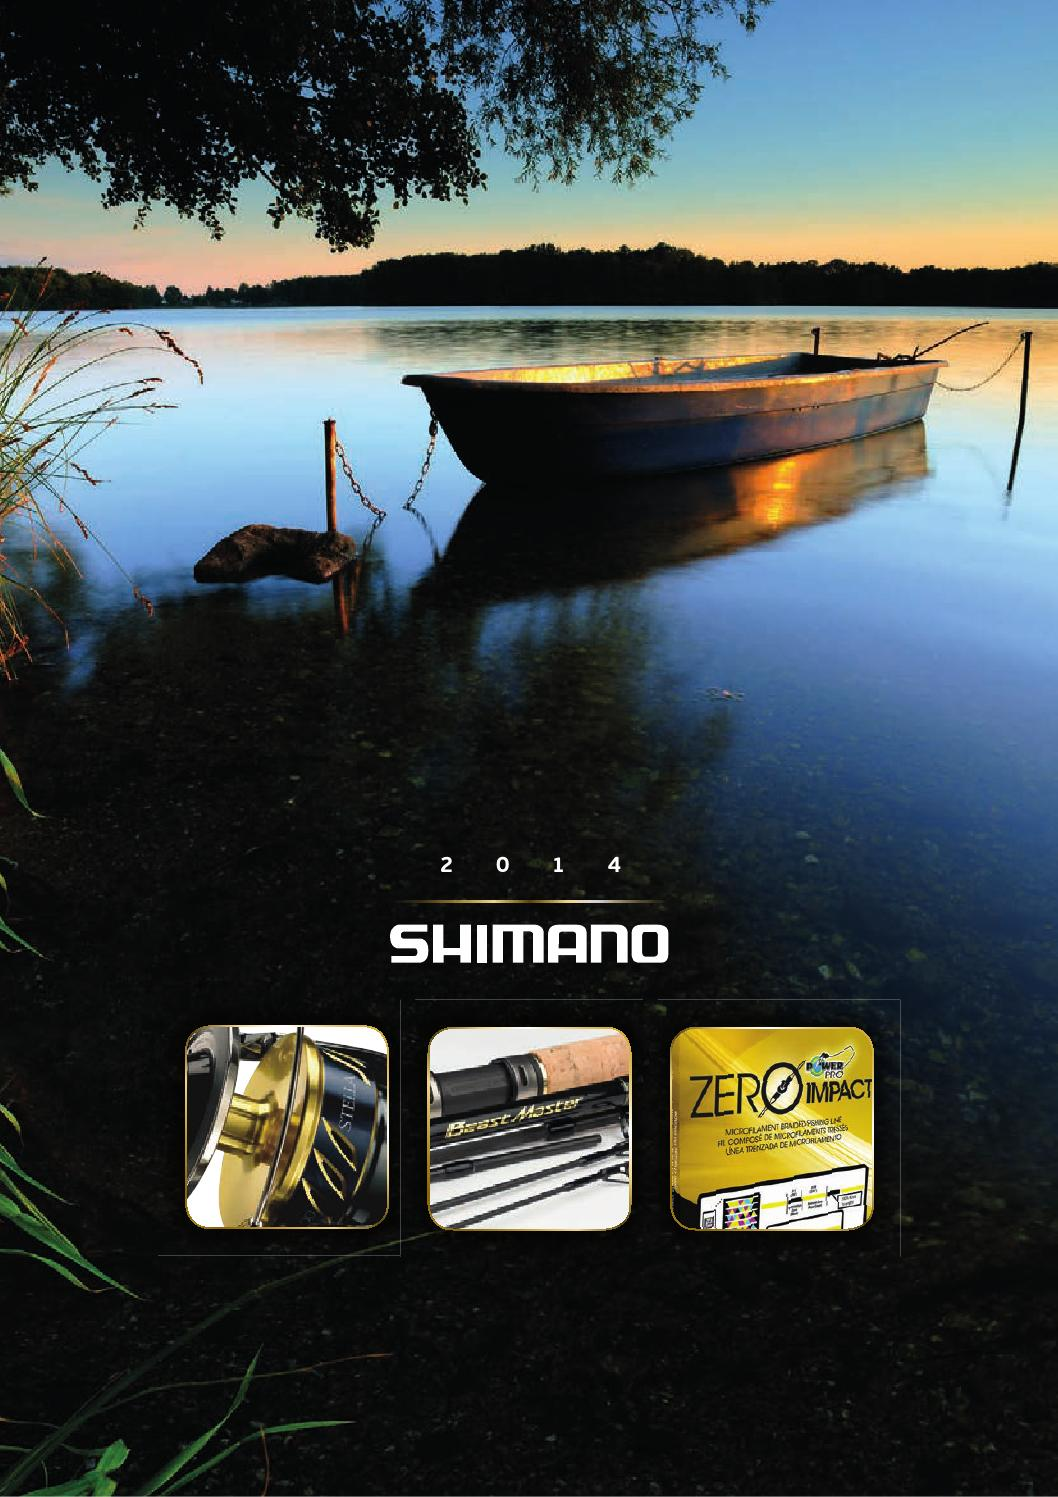 e3d4b91ad6 Shimano 2014 by chris crampe - issuu